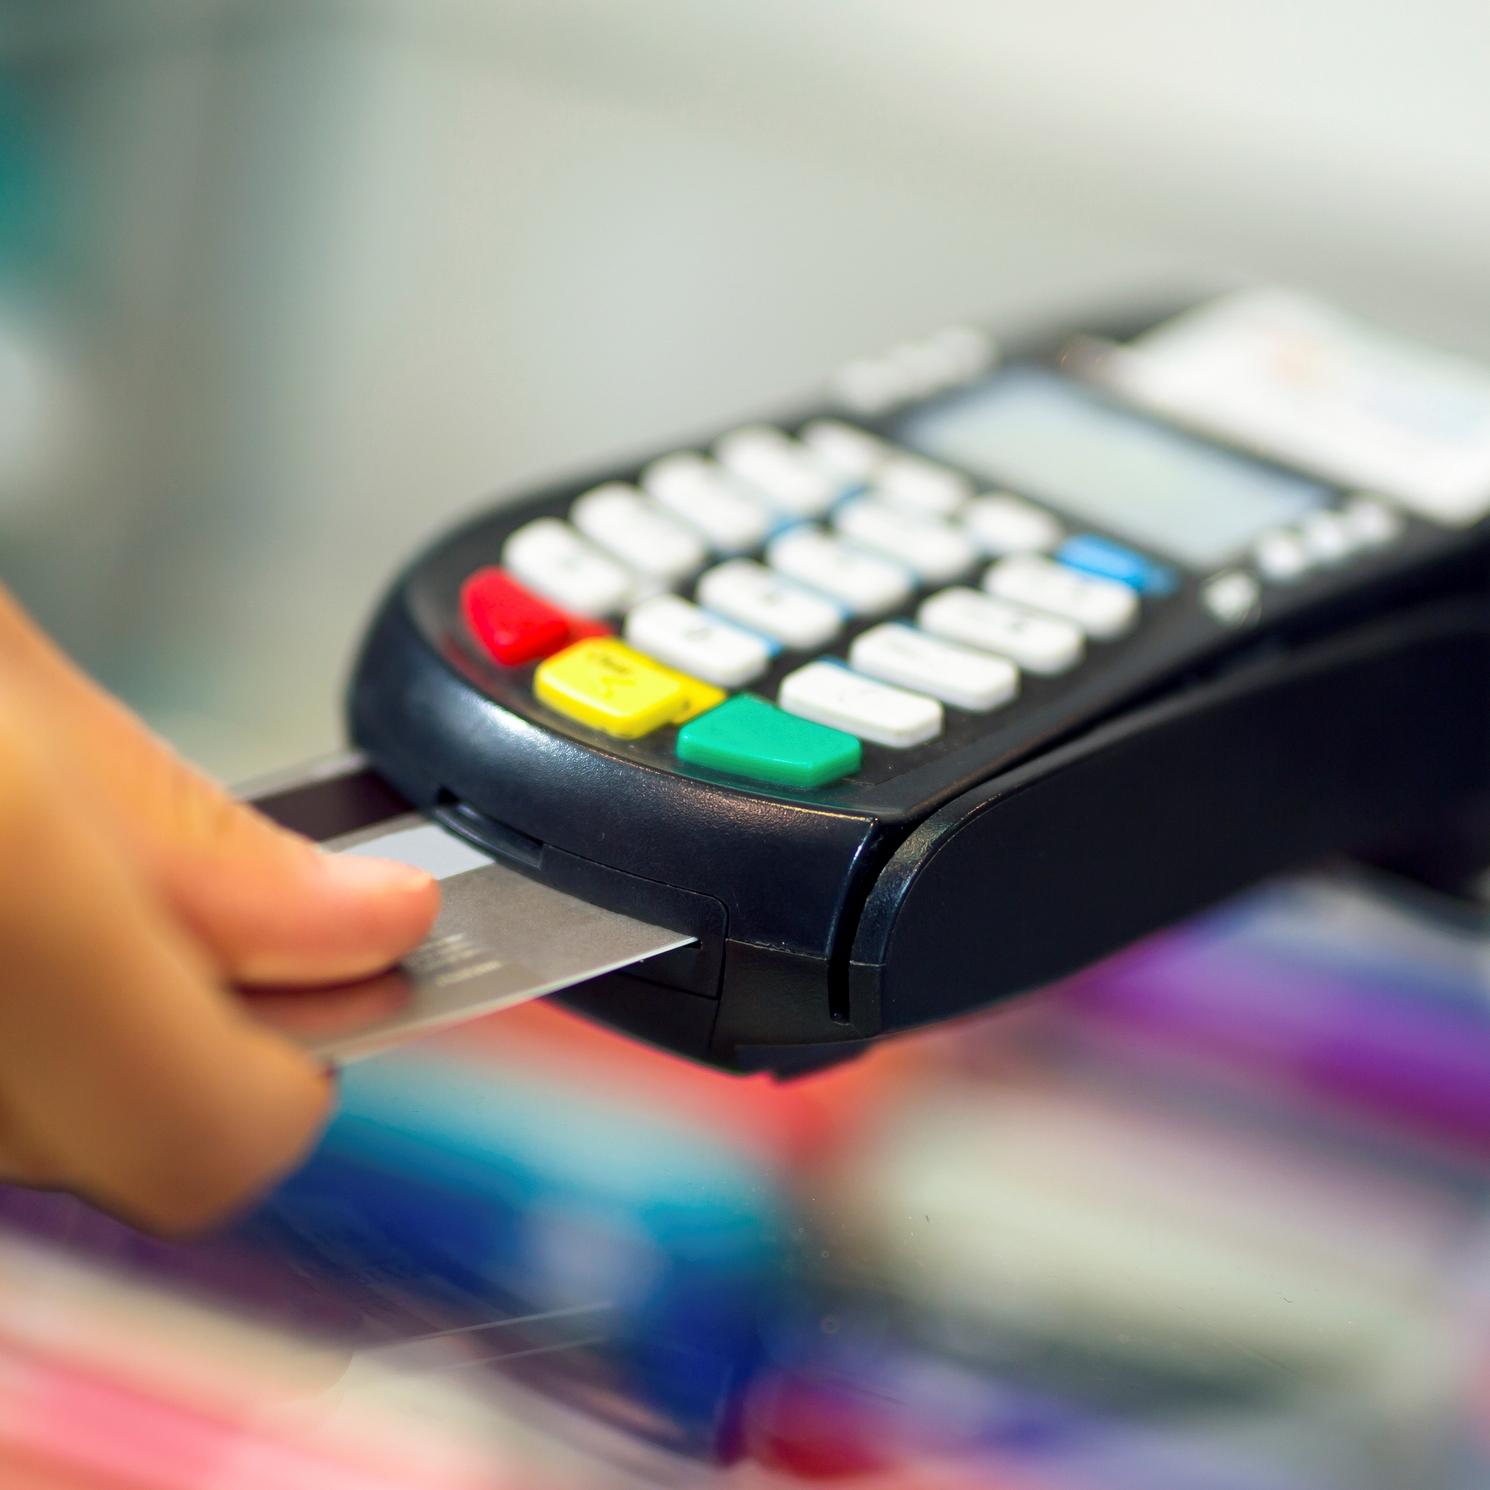 Olpqeqwr42mq1yrqgtmv+emv_credit_card_(sm)